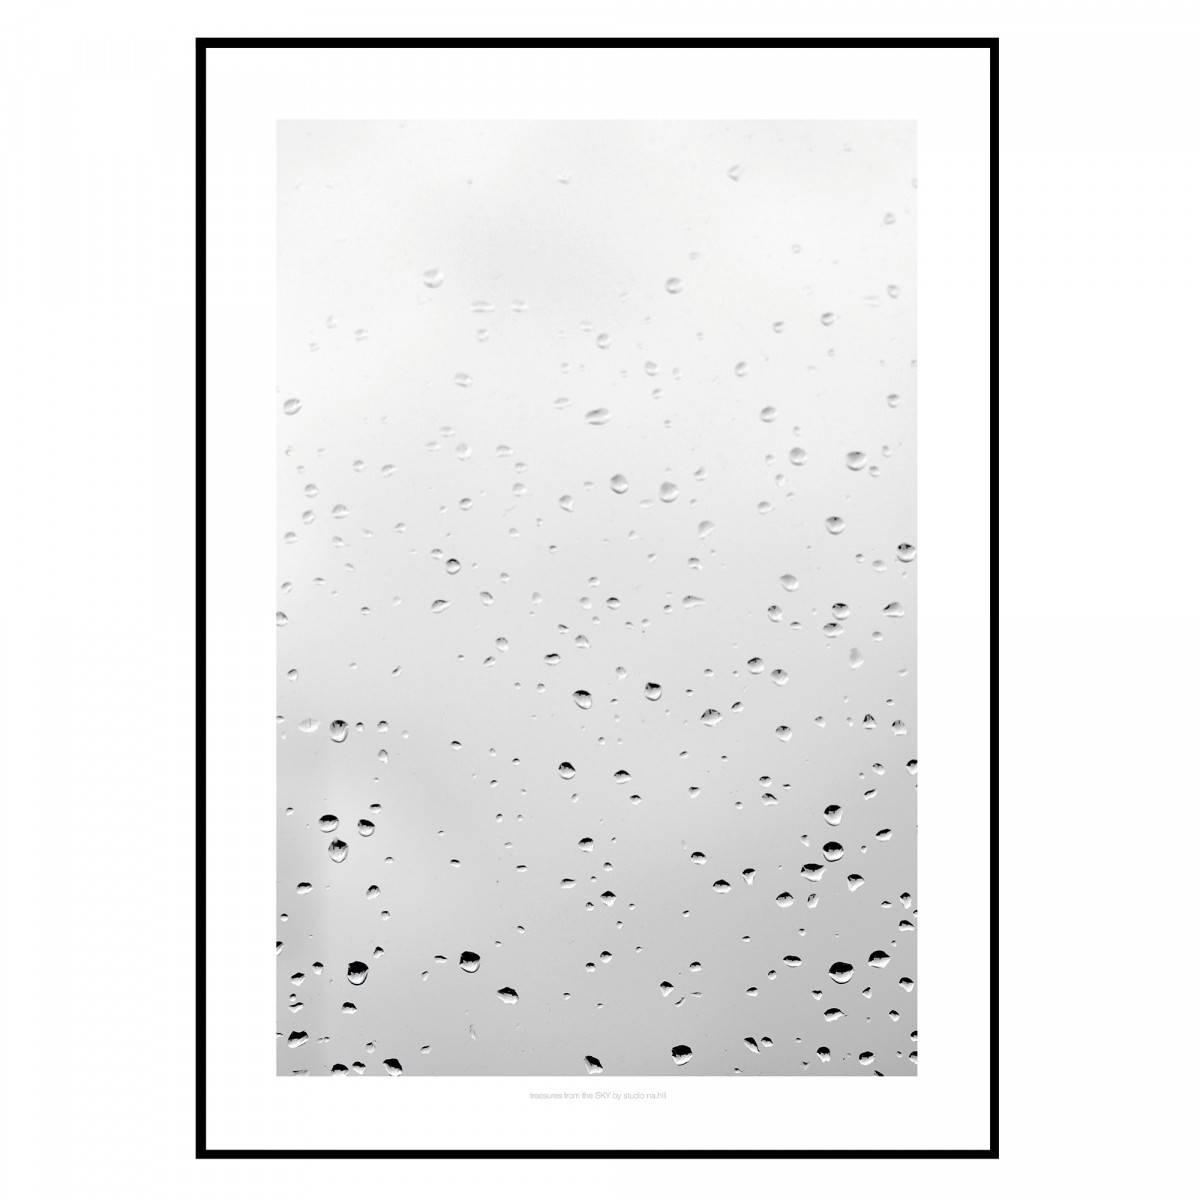 na.hili Treasures from the SKY Artprint 50x70 Poster